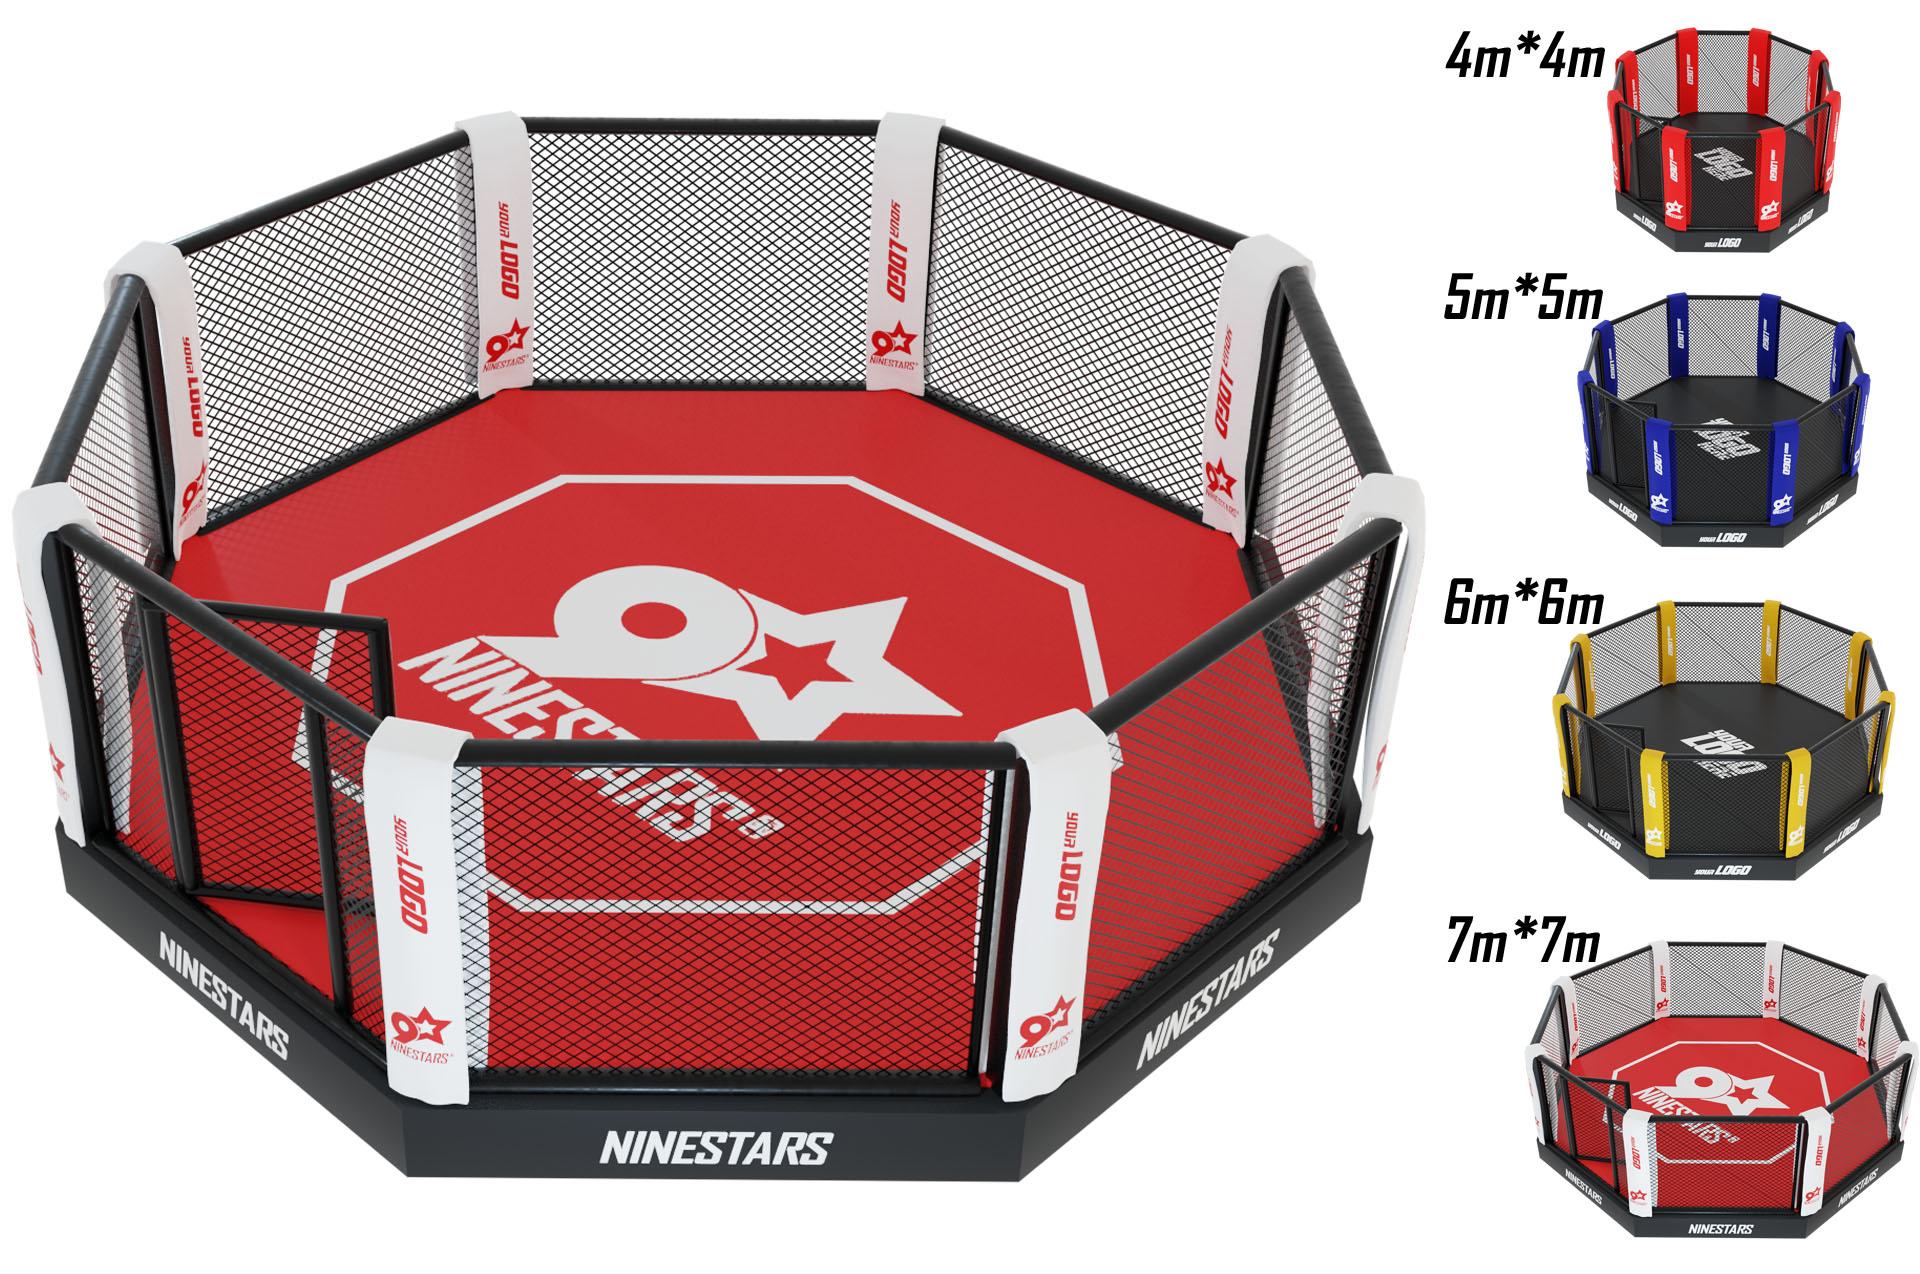 Cage de Combat Libre avec Podium 10cm